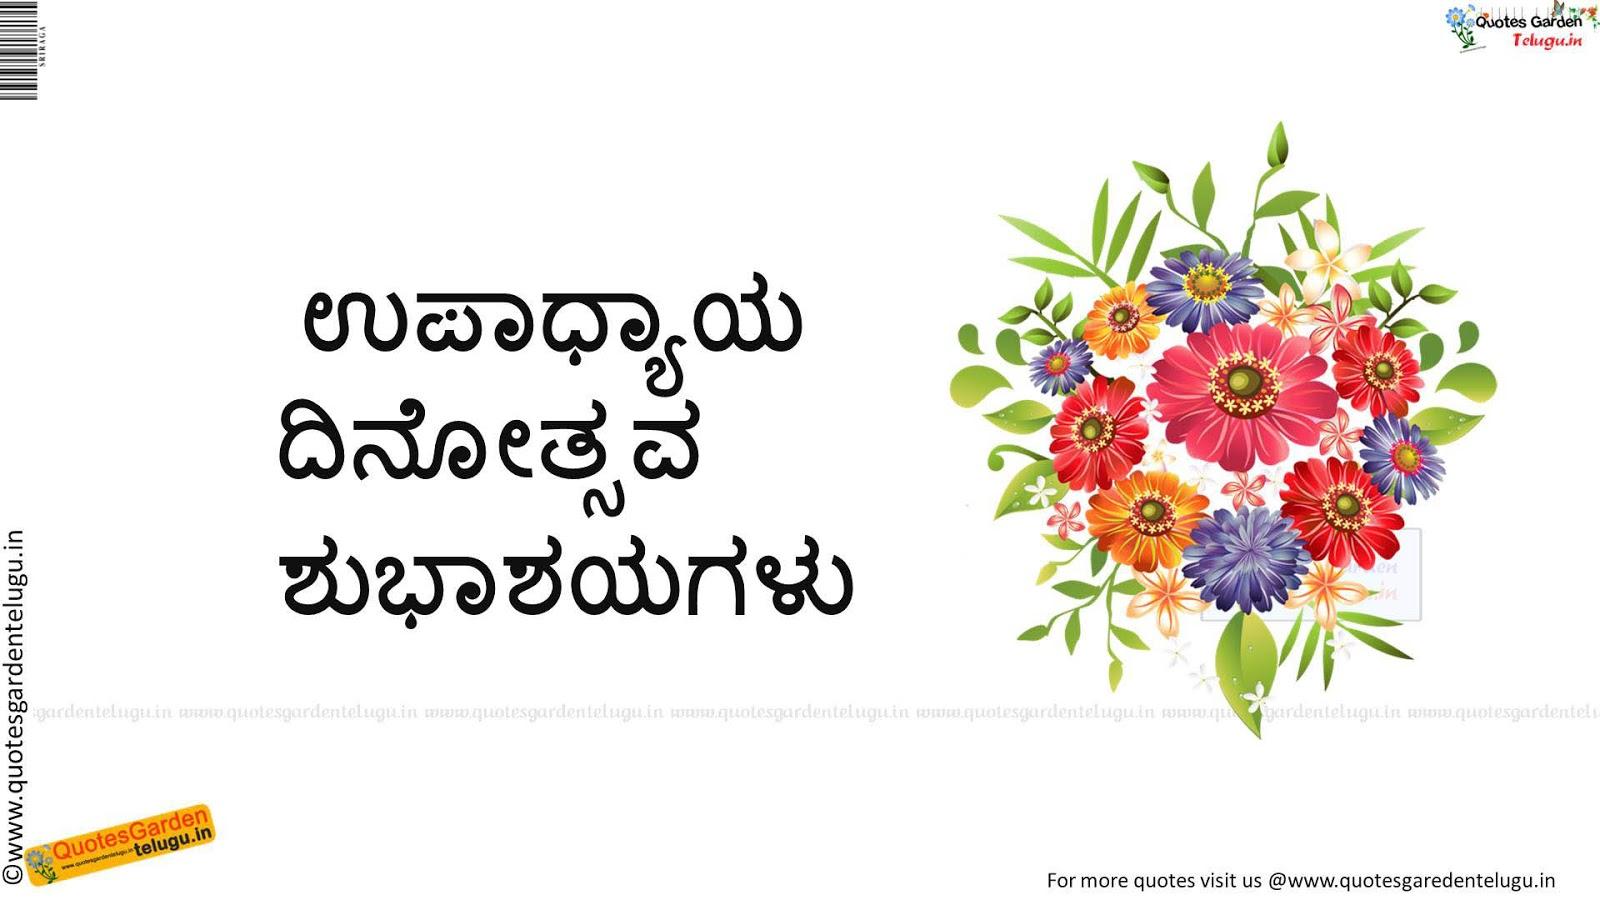 Teachersday hdwallpaper quotes greetings messages in kannada teachersday hdwallpaper quotes greetings messages in kannada m4hsunfo